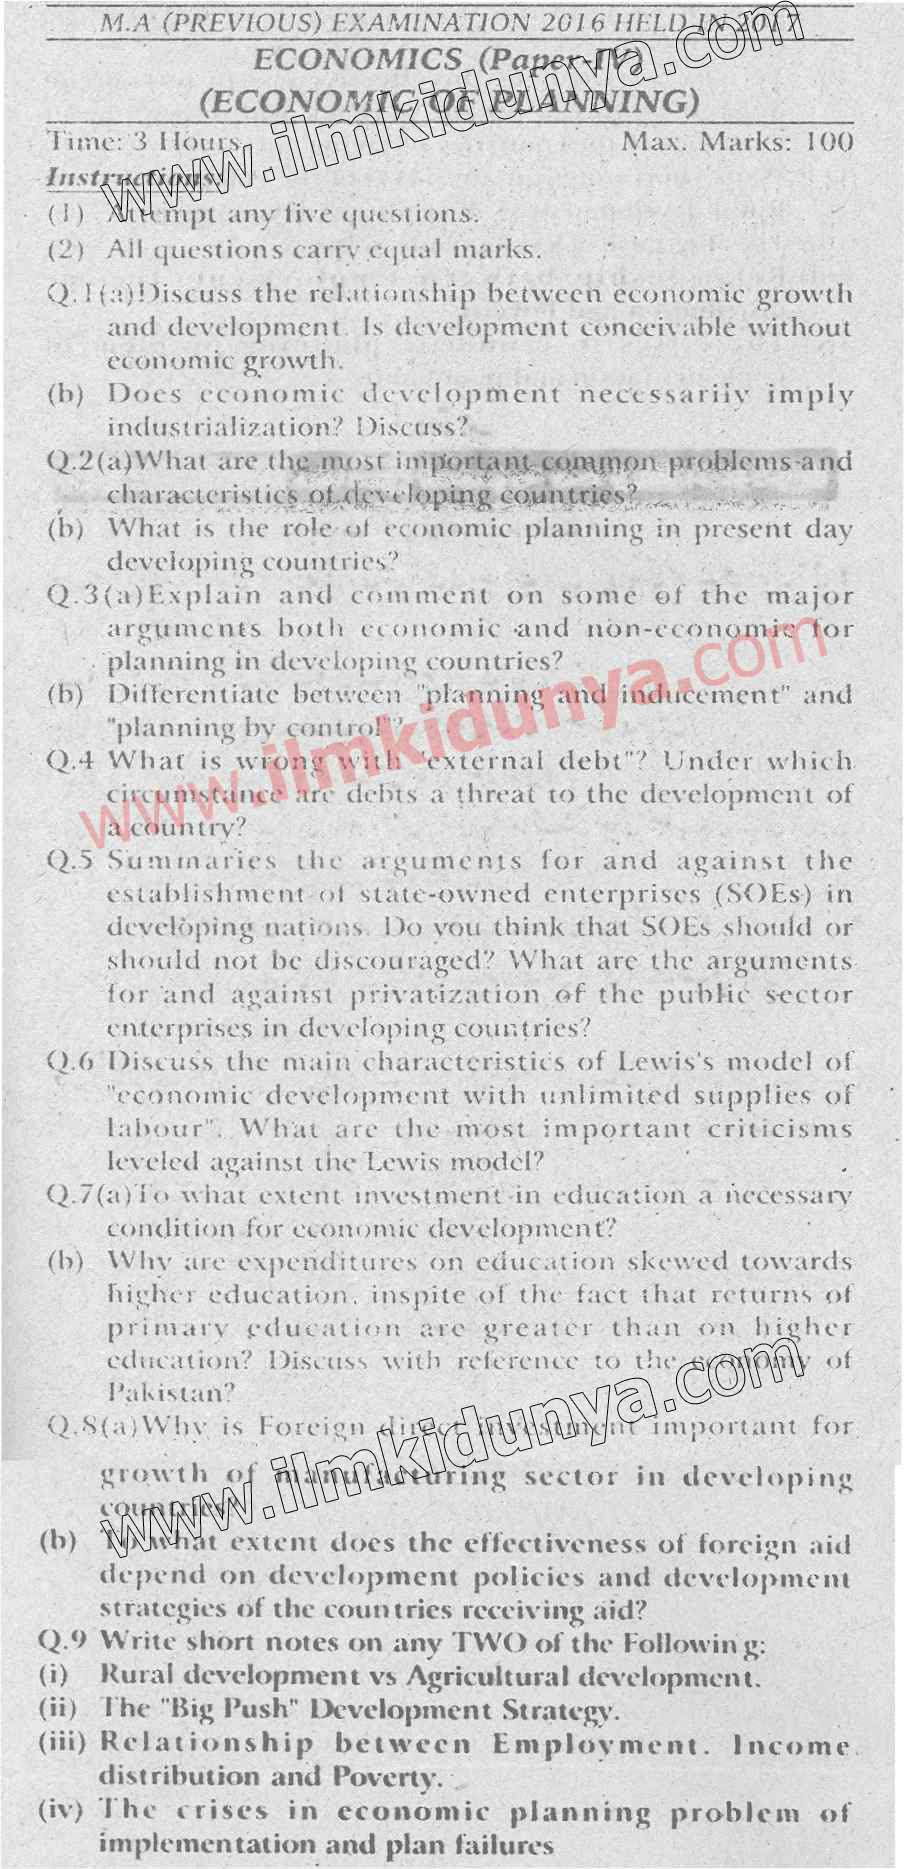 Past Papers 2017 Punjab University MA Economics Part 1 English Paper 4